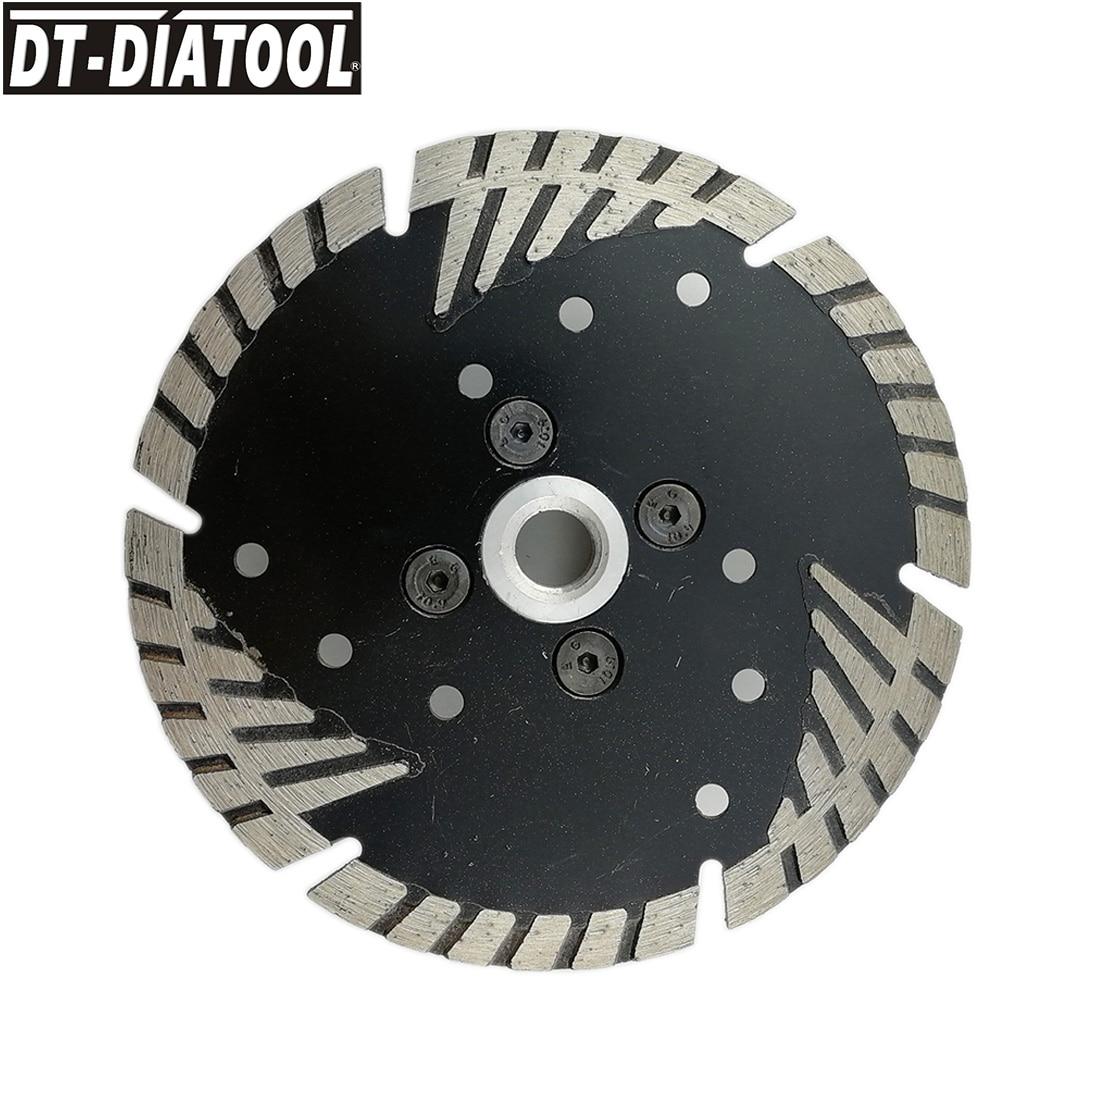 DT-DIATOOL 1pc 115mm/4.5